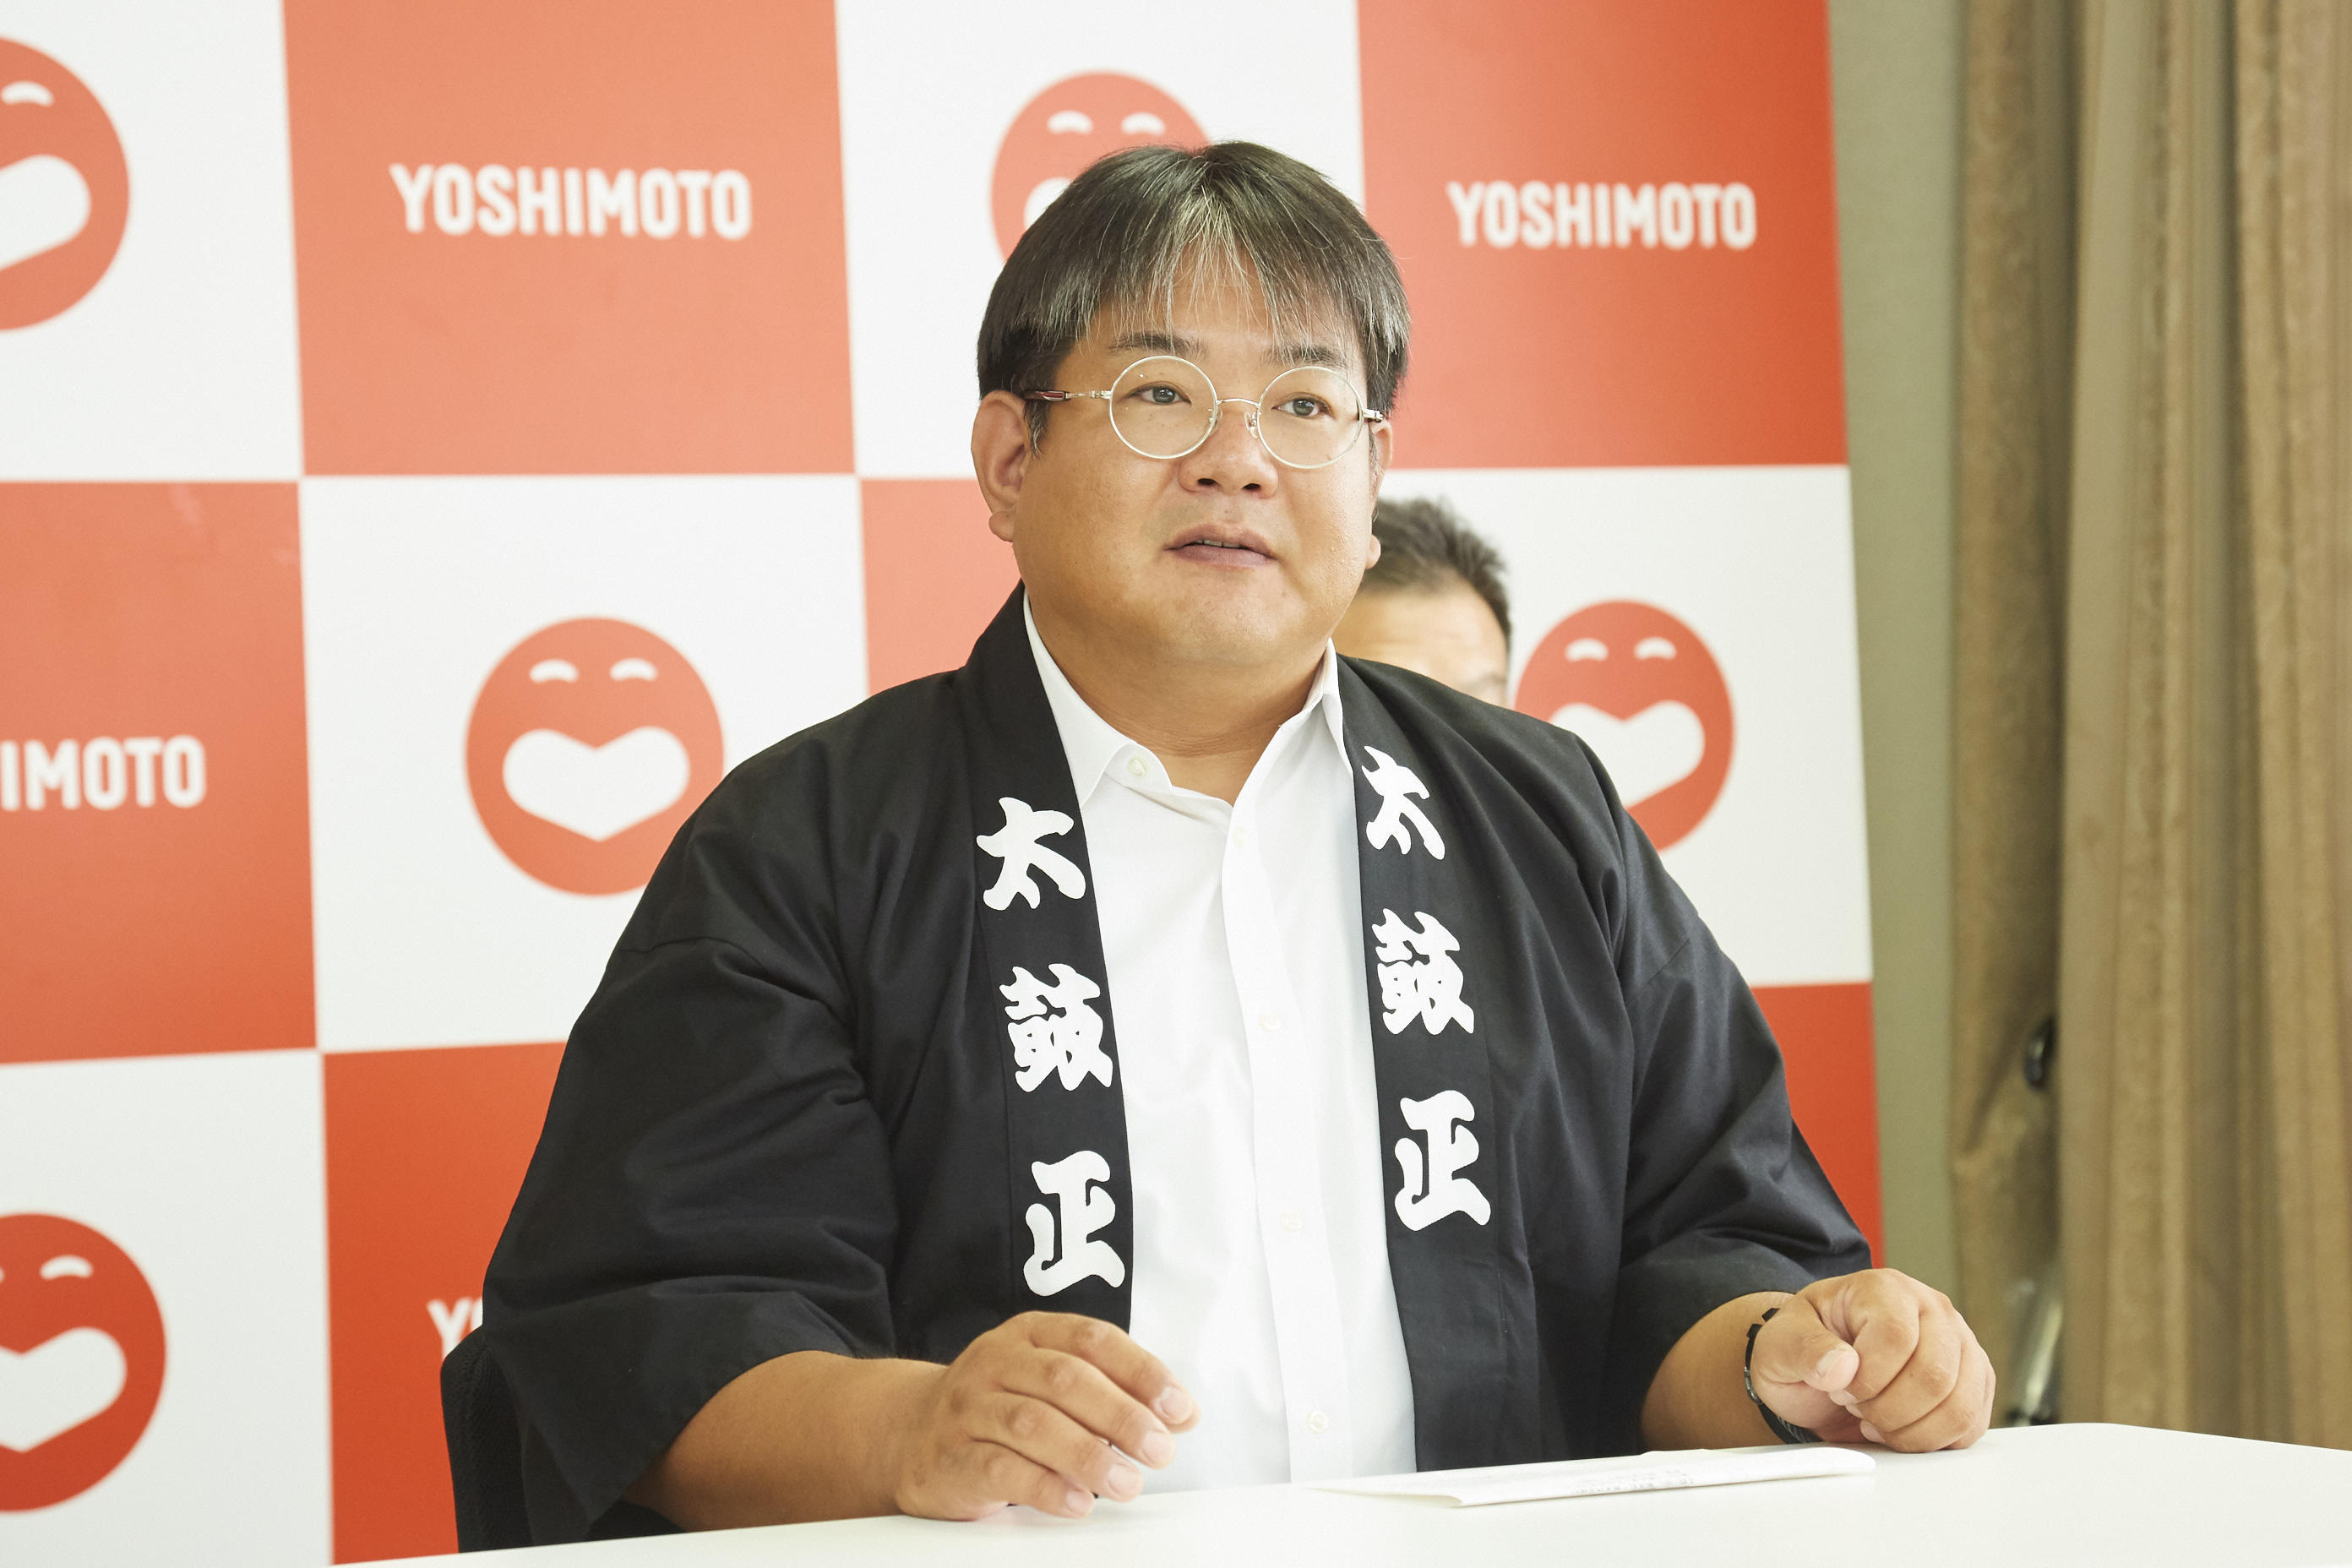 http://news.yoshimoto.co.jp/20180704193414-09d45a1db952d0b239968e8da597d6cb6ab0163e.jpg